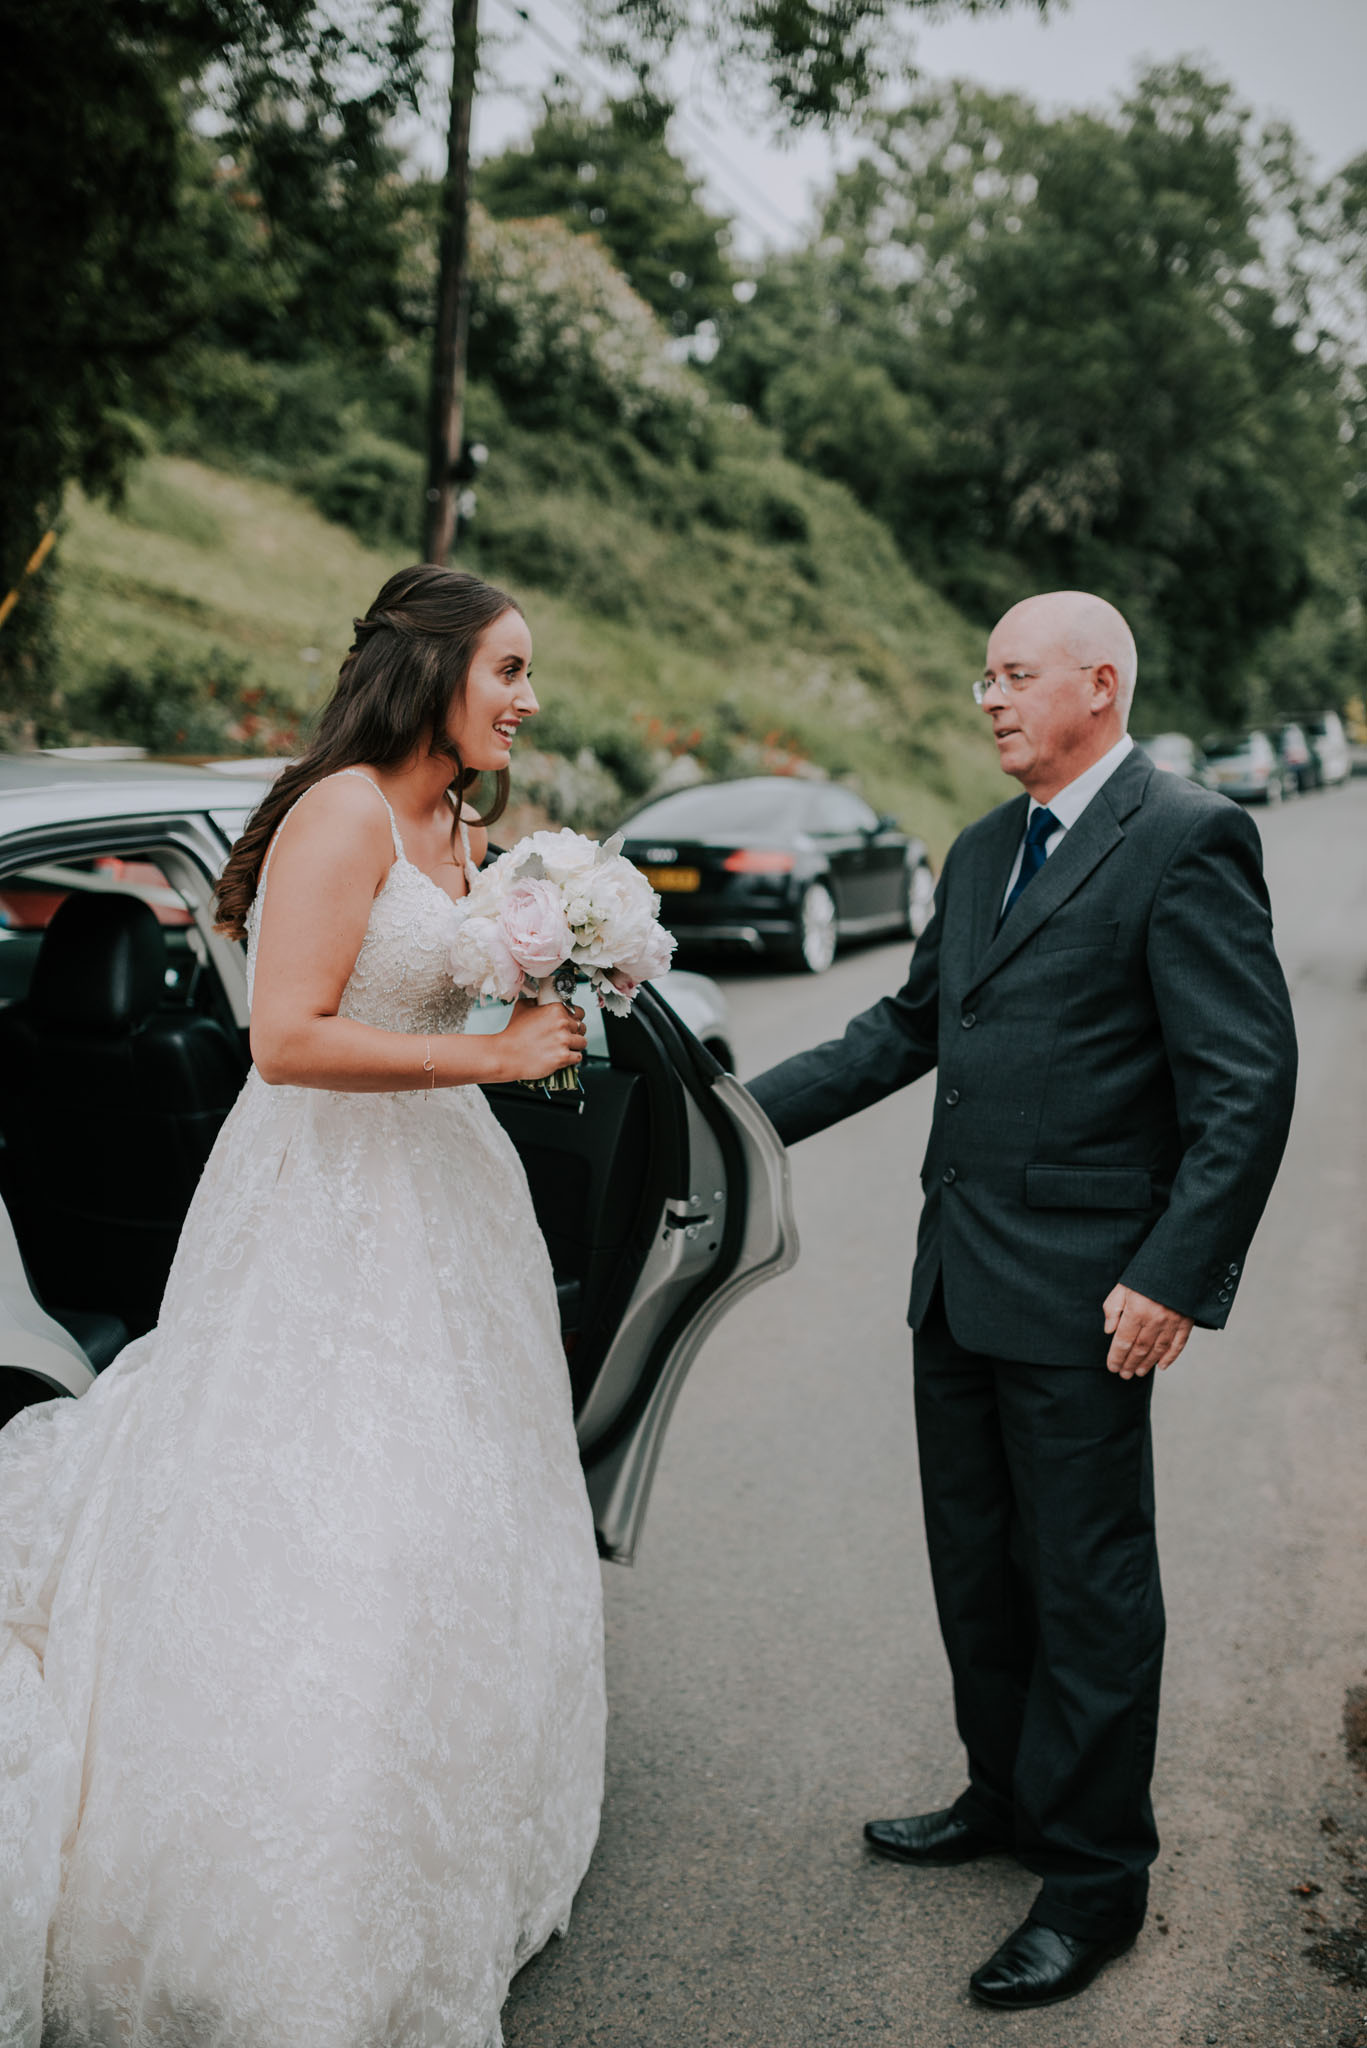 wedding-photographer-glewstone-court-hereford-scott-stockwell-photography129.jpg